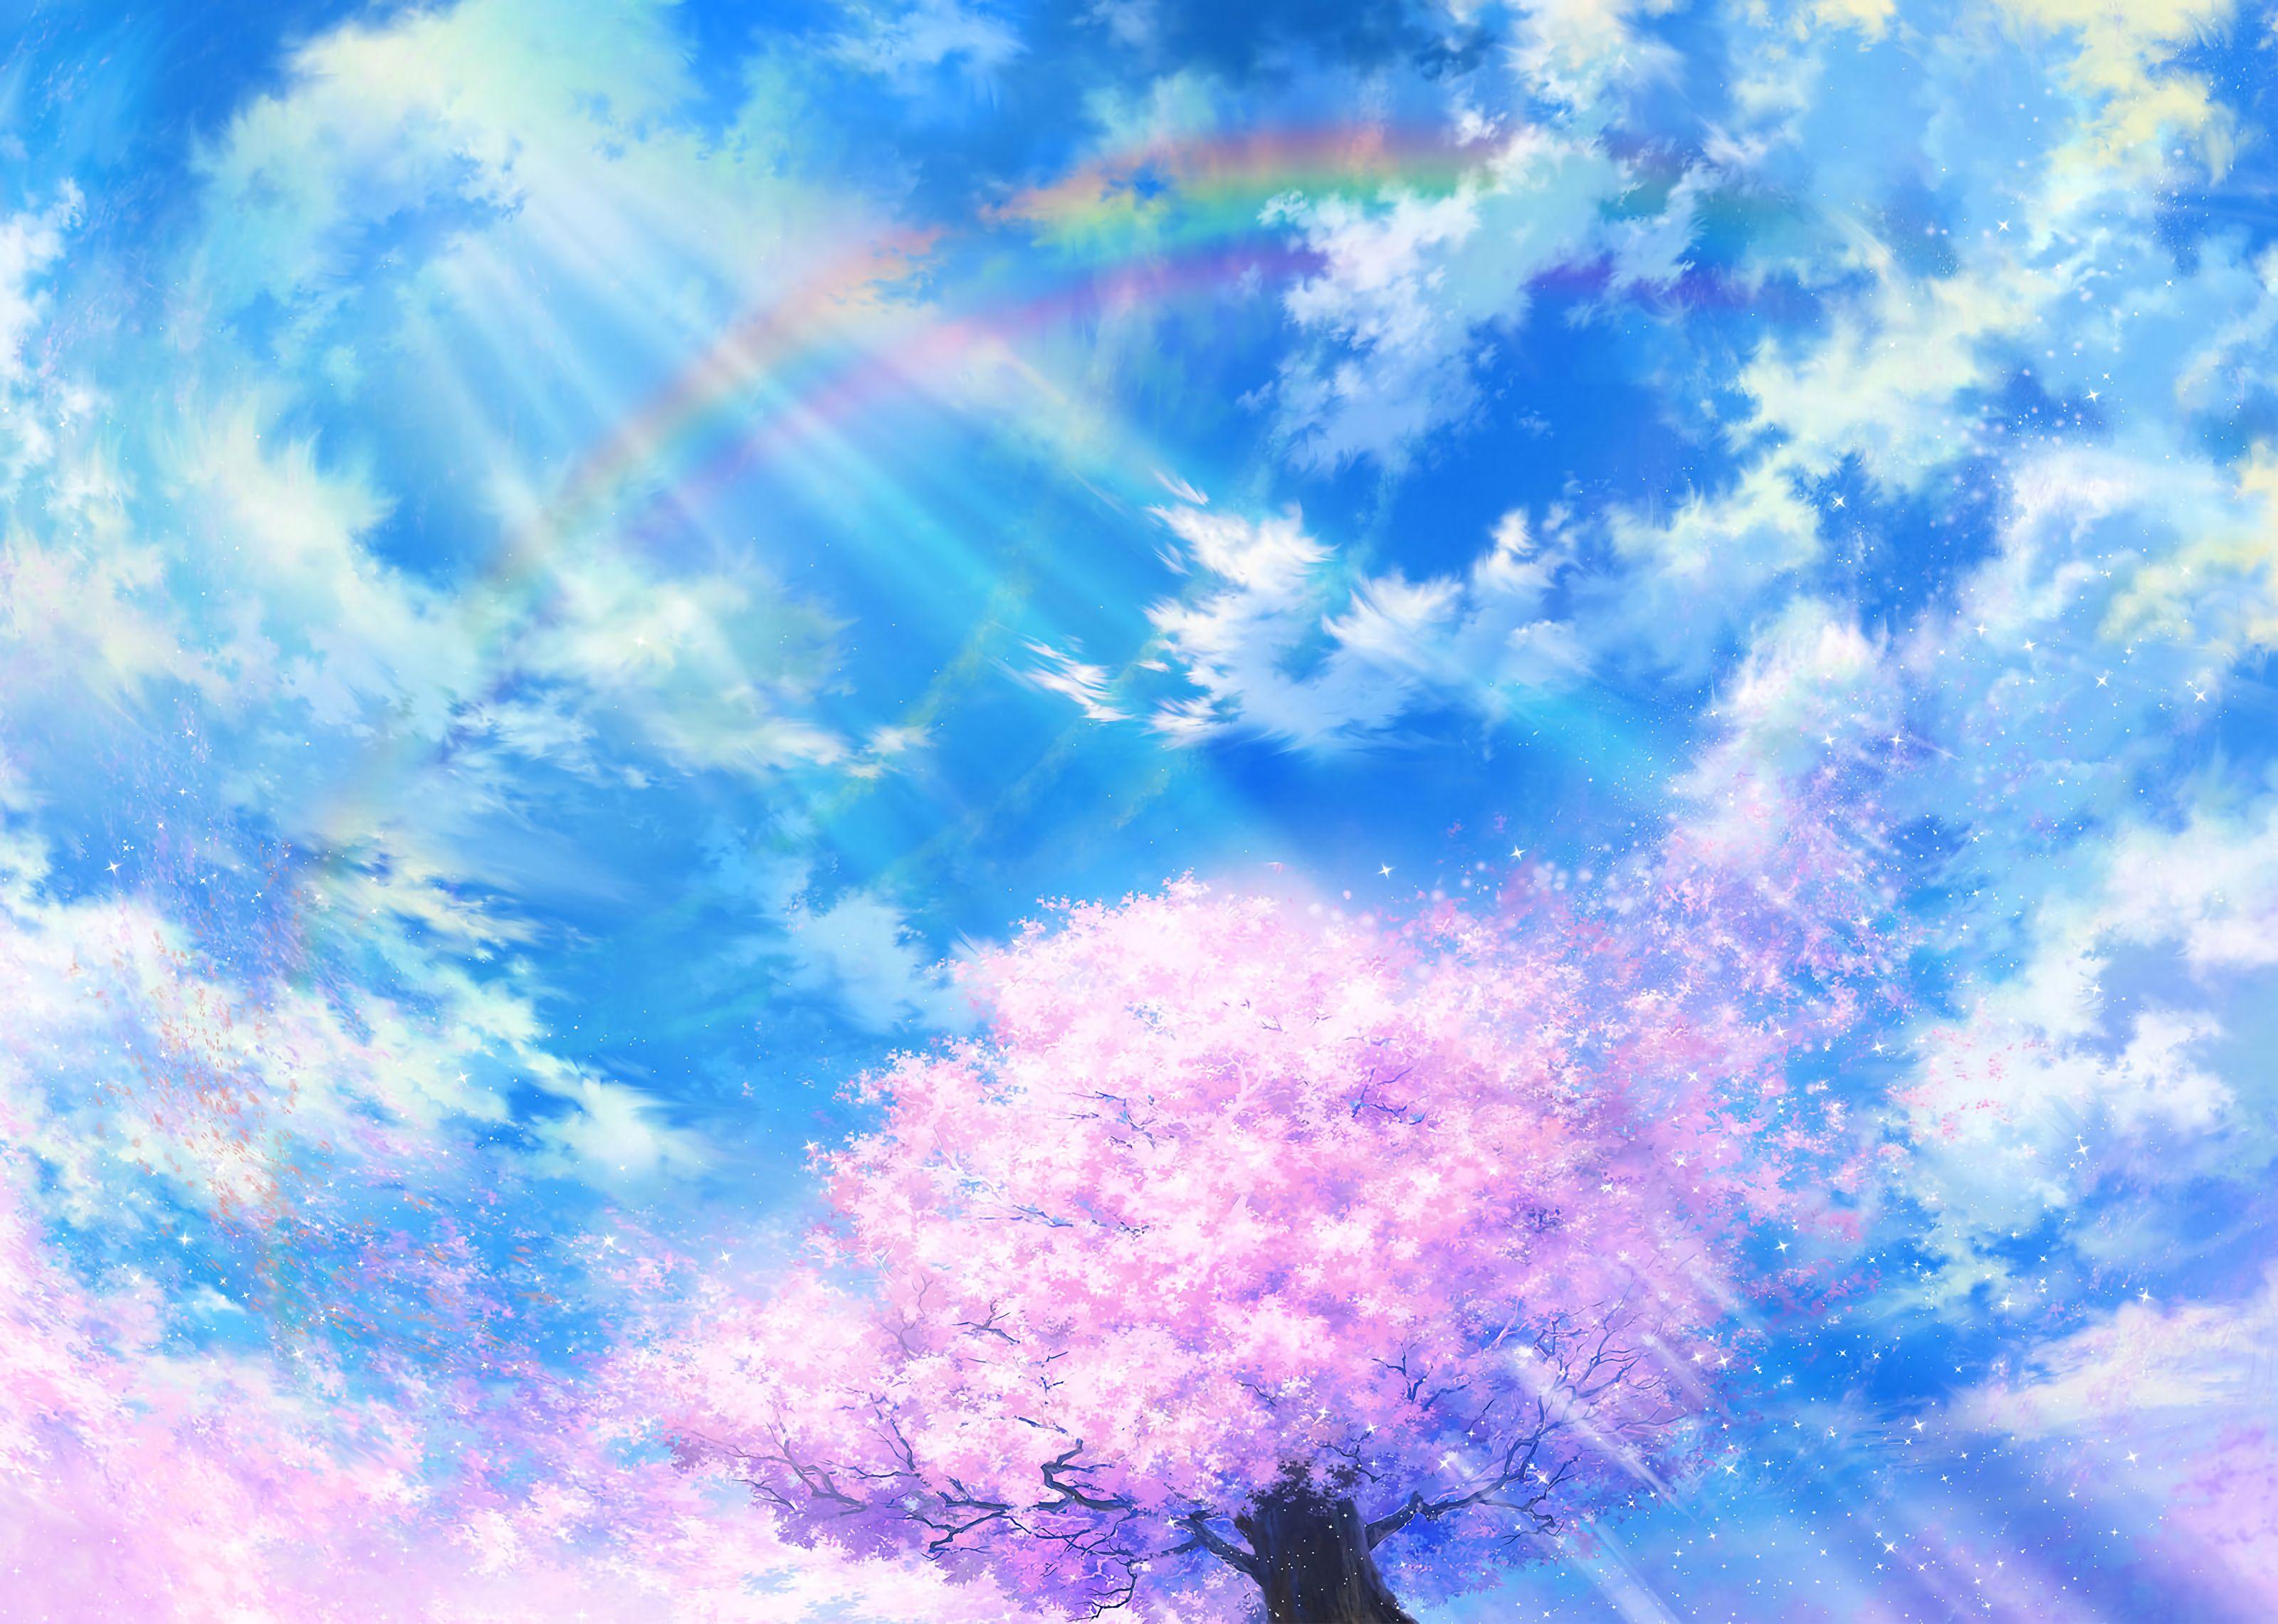 83715 Screensavers and Wallpapers Sakura for phone. Download Sakura, Sky, Art, Clouds, Rainbow, Bloom, Flowering pictures for free